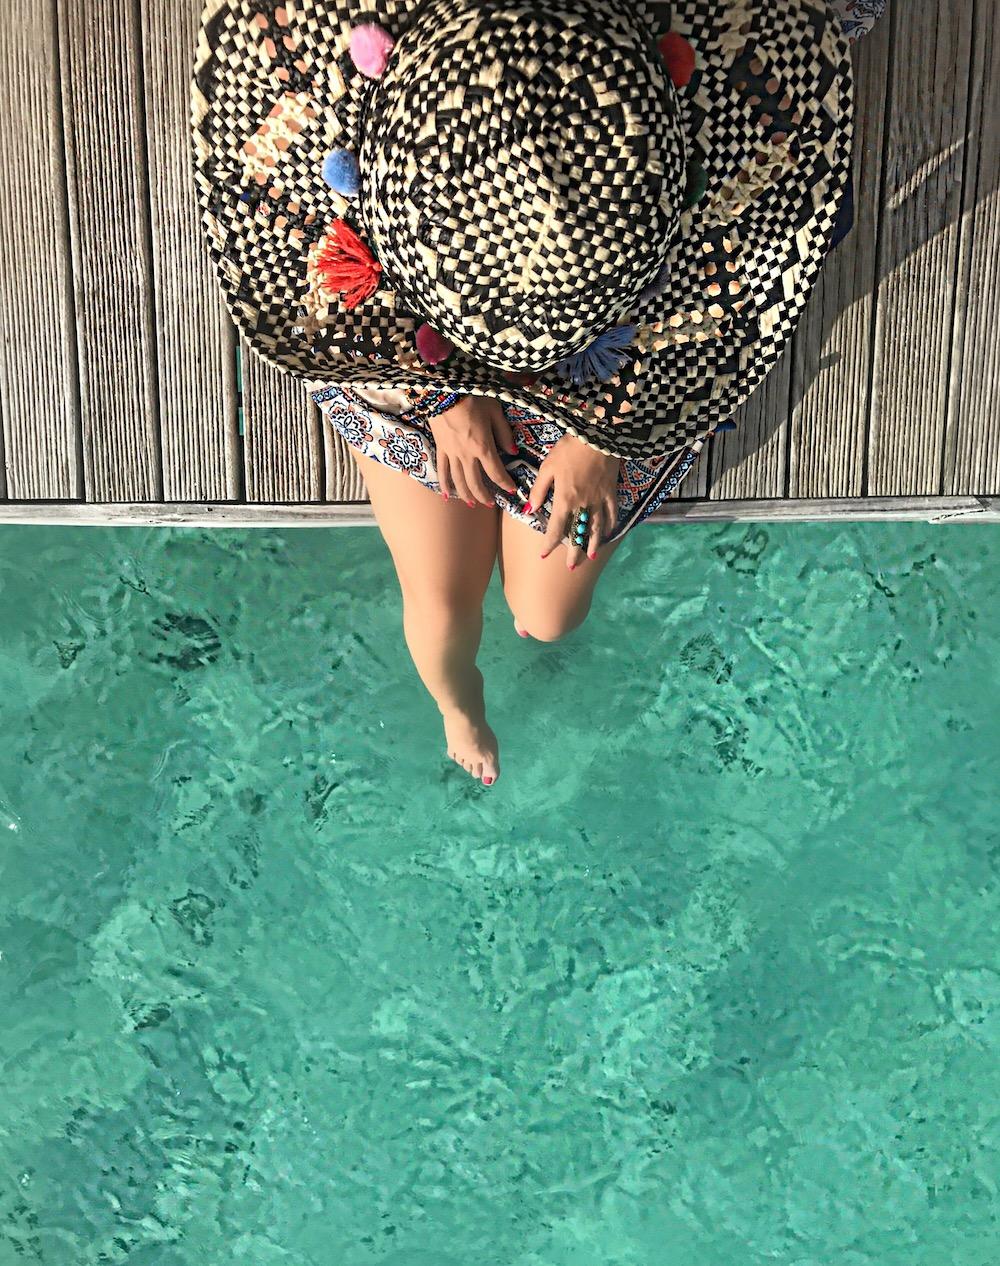 ocean-side-photos-alley-girl-fashion-travel-life-style-blog